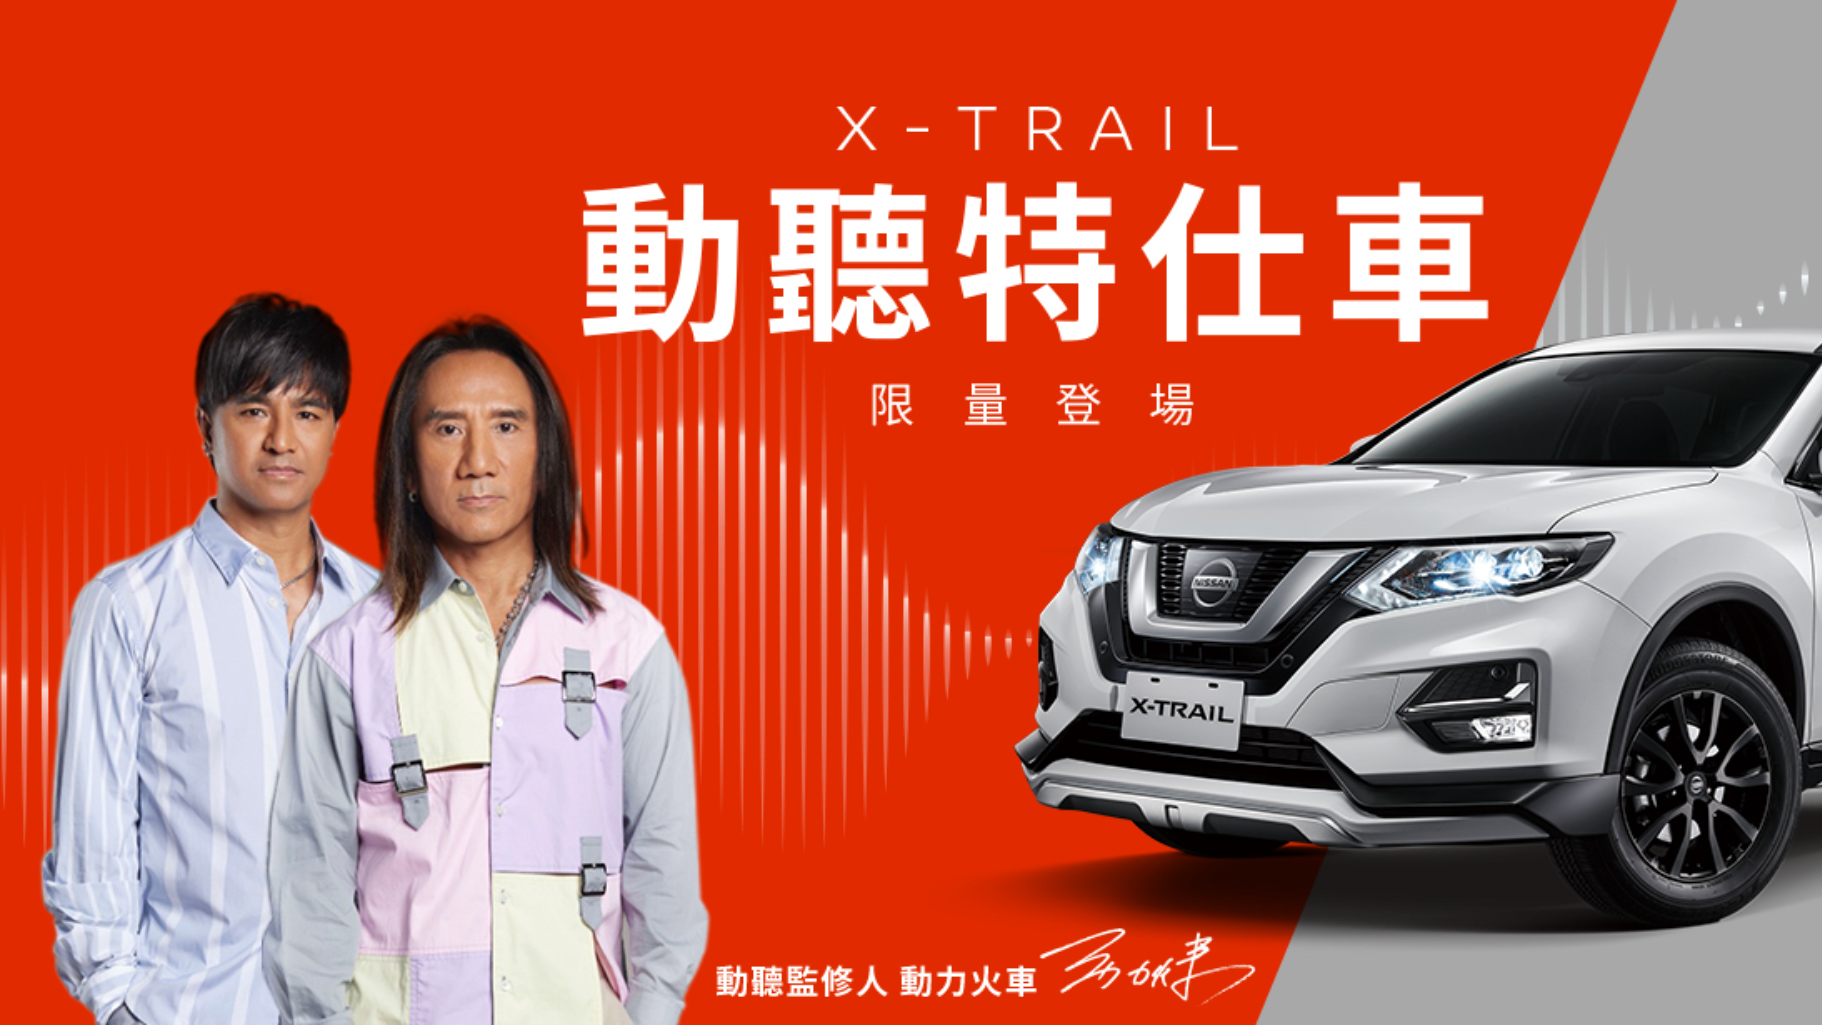 Nissan X-Trail 動聽特仕車  限量 100 台舊換新動聽價 93.5 萬元起